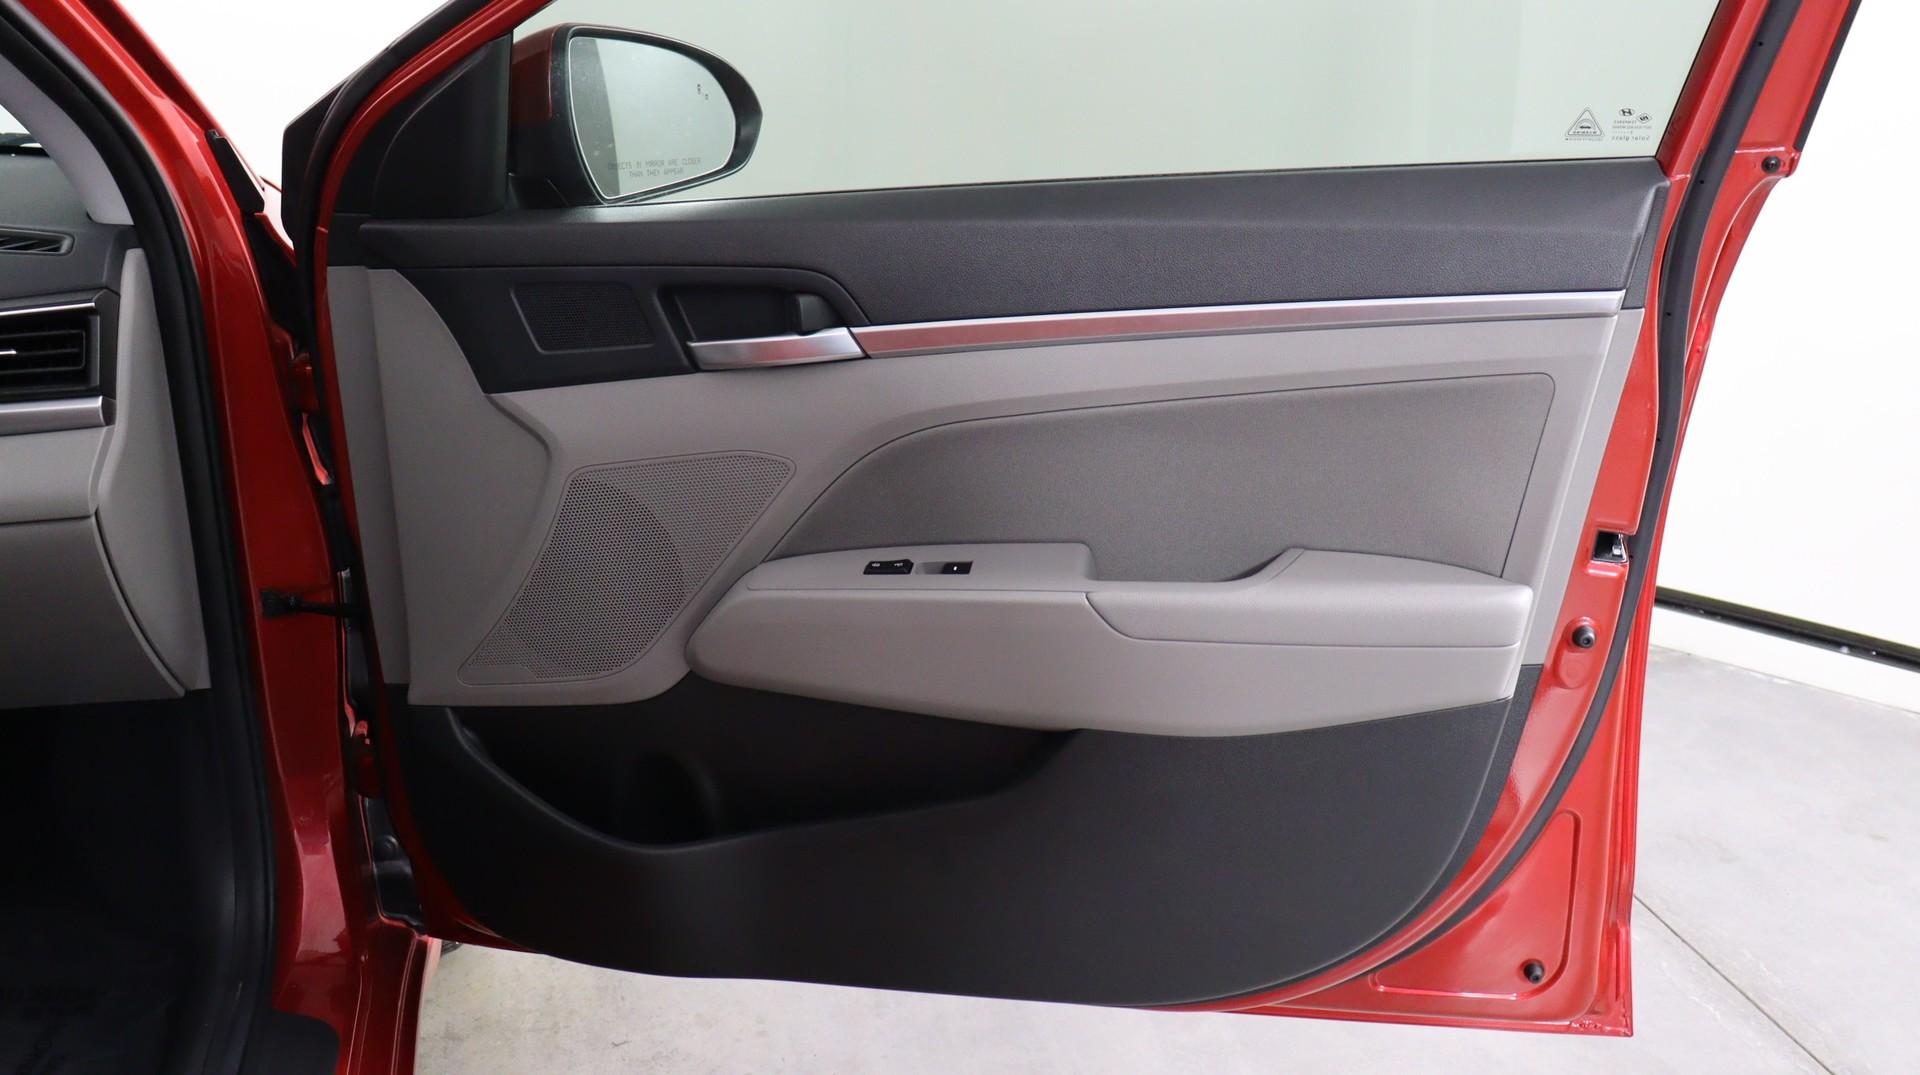 Carvix - Used vehicle - Sedan HYUNDAI ELANTRA 2020